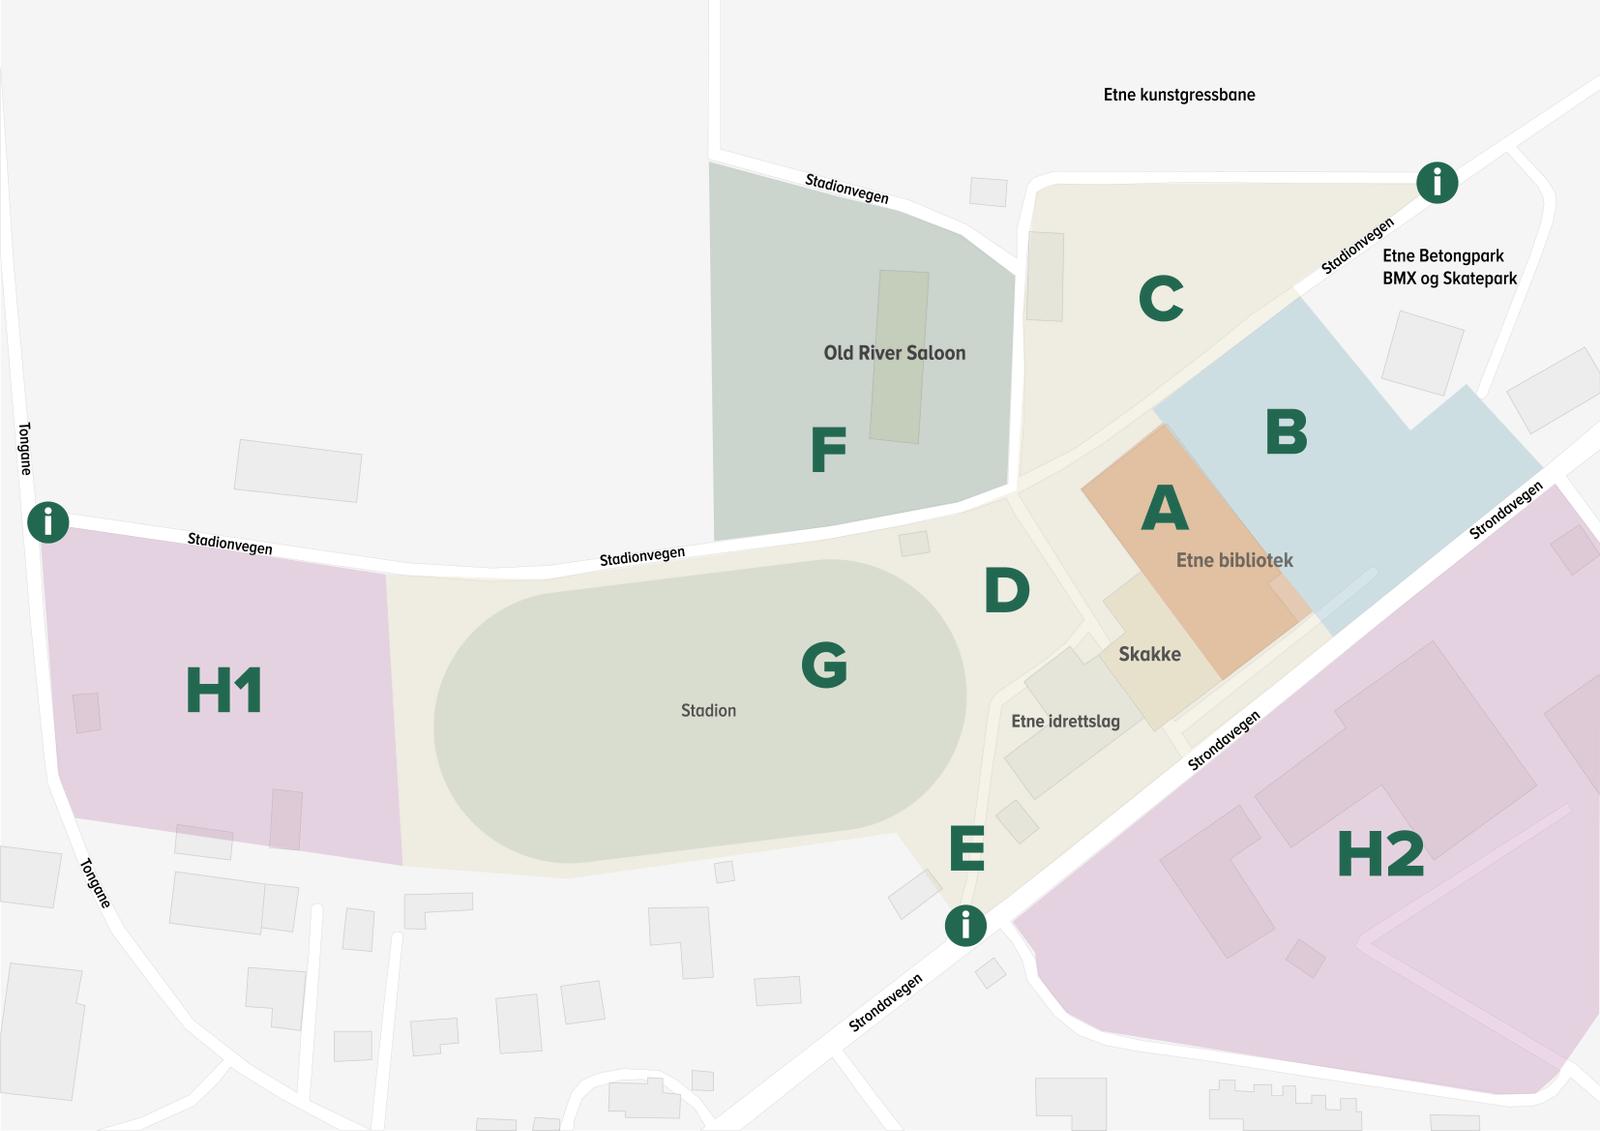 Kart over utstillar område